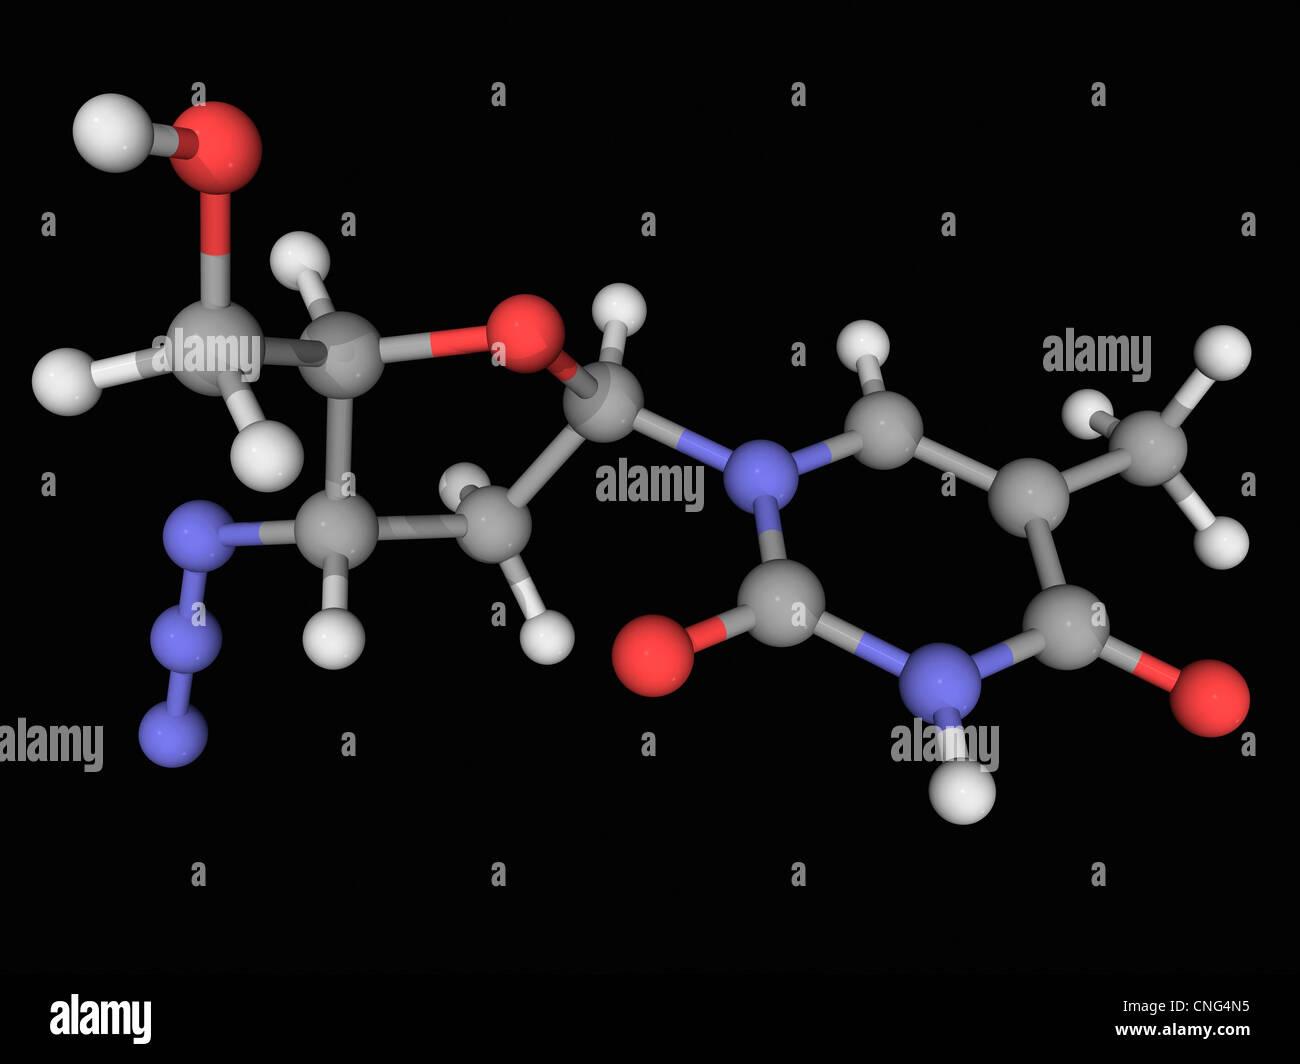 Zidovudine drug molecule - Stock Image